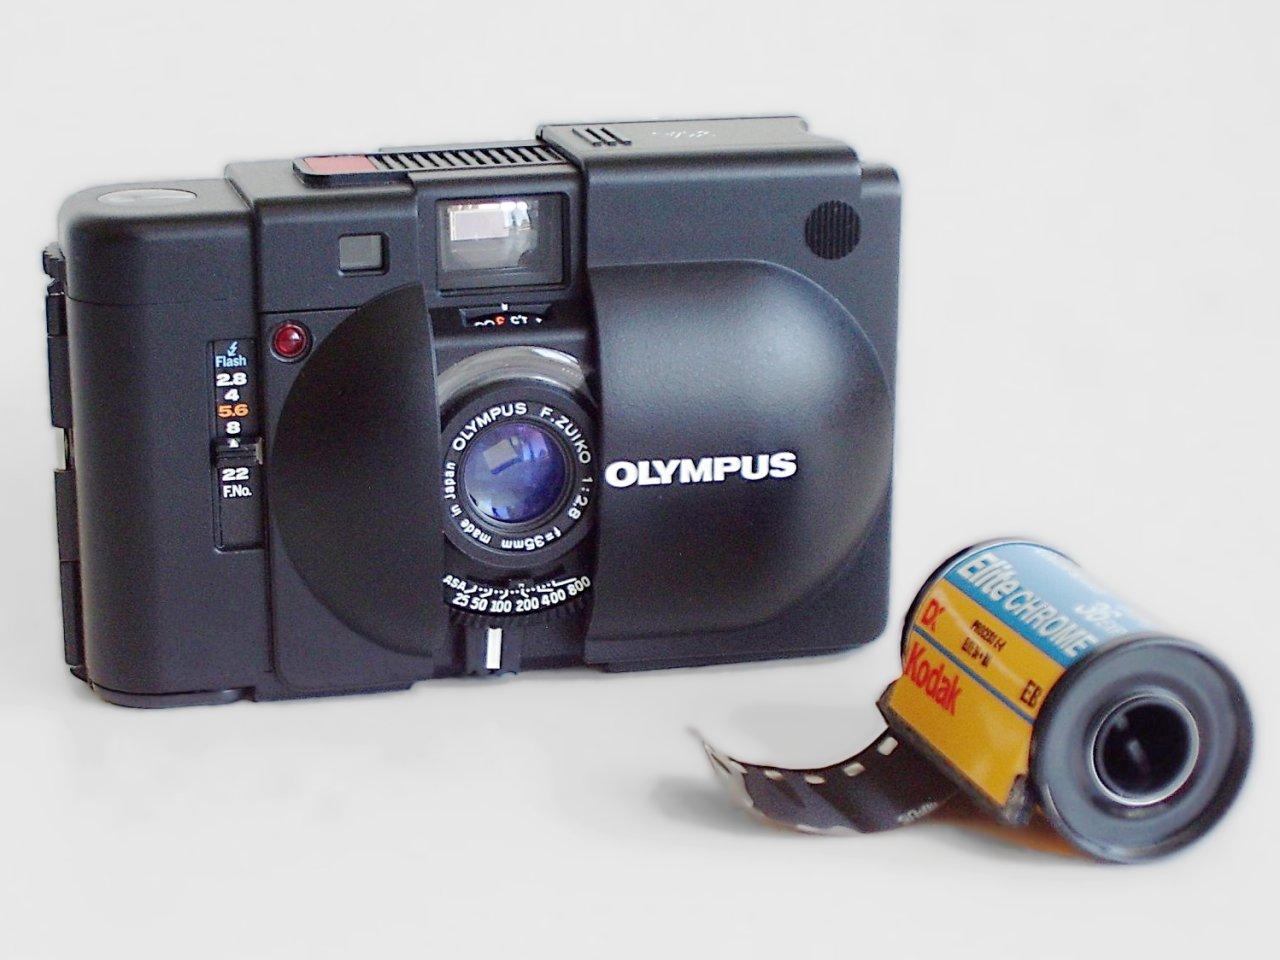 File:Olympus XA camera and film.jpg - Wikimedia Commons